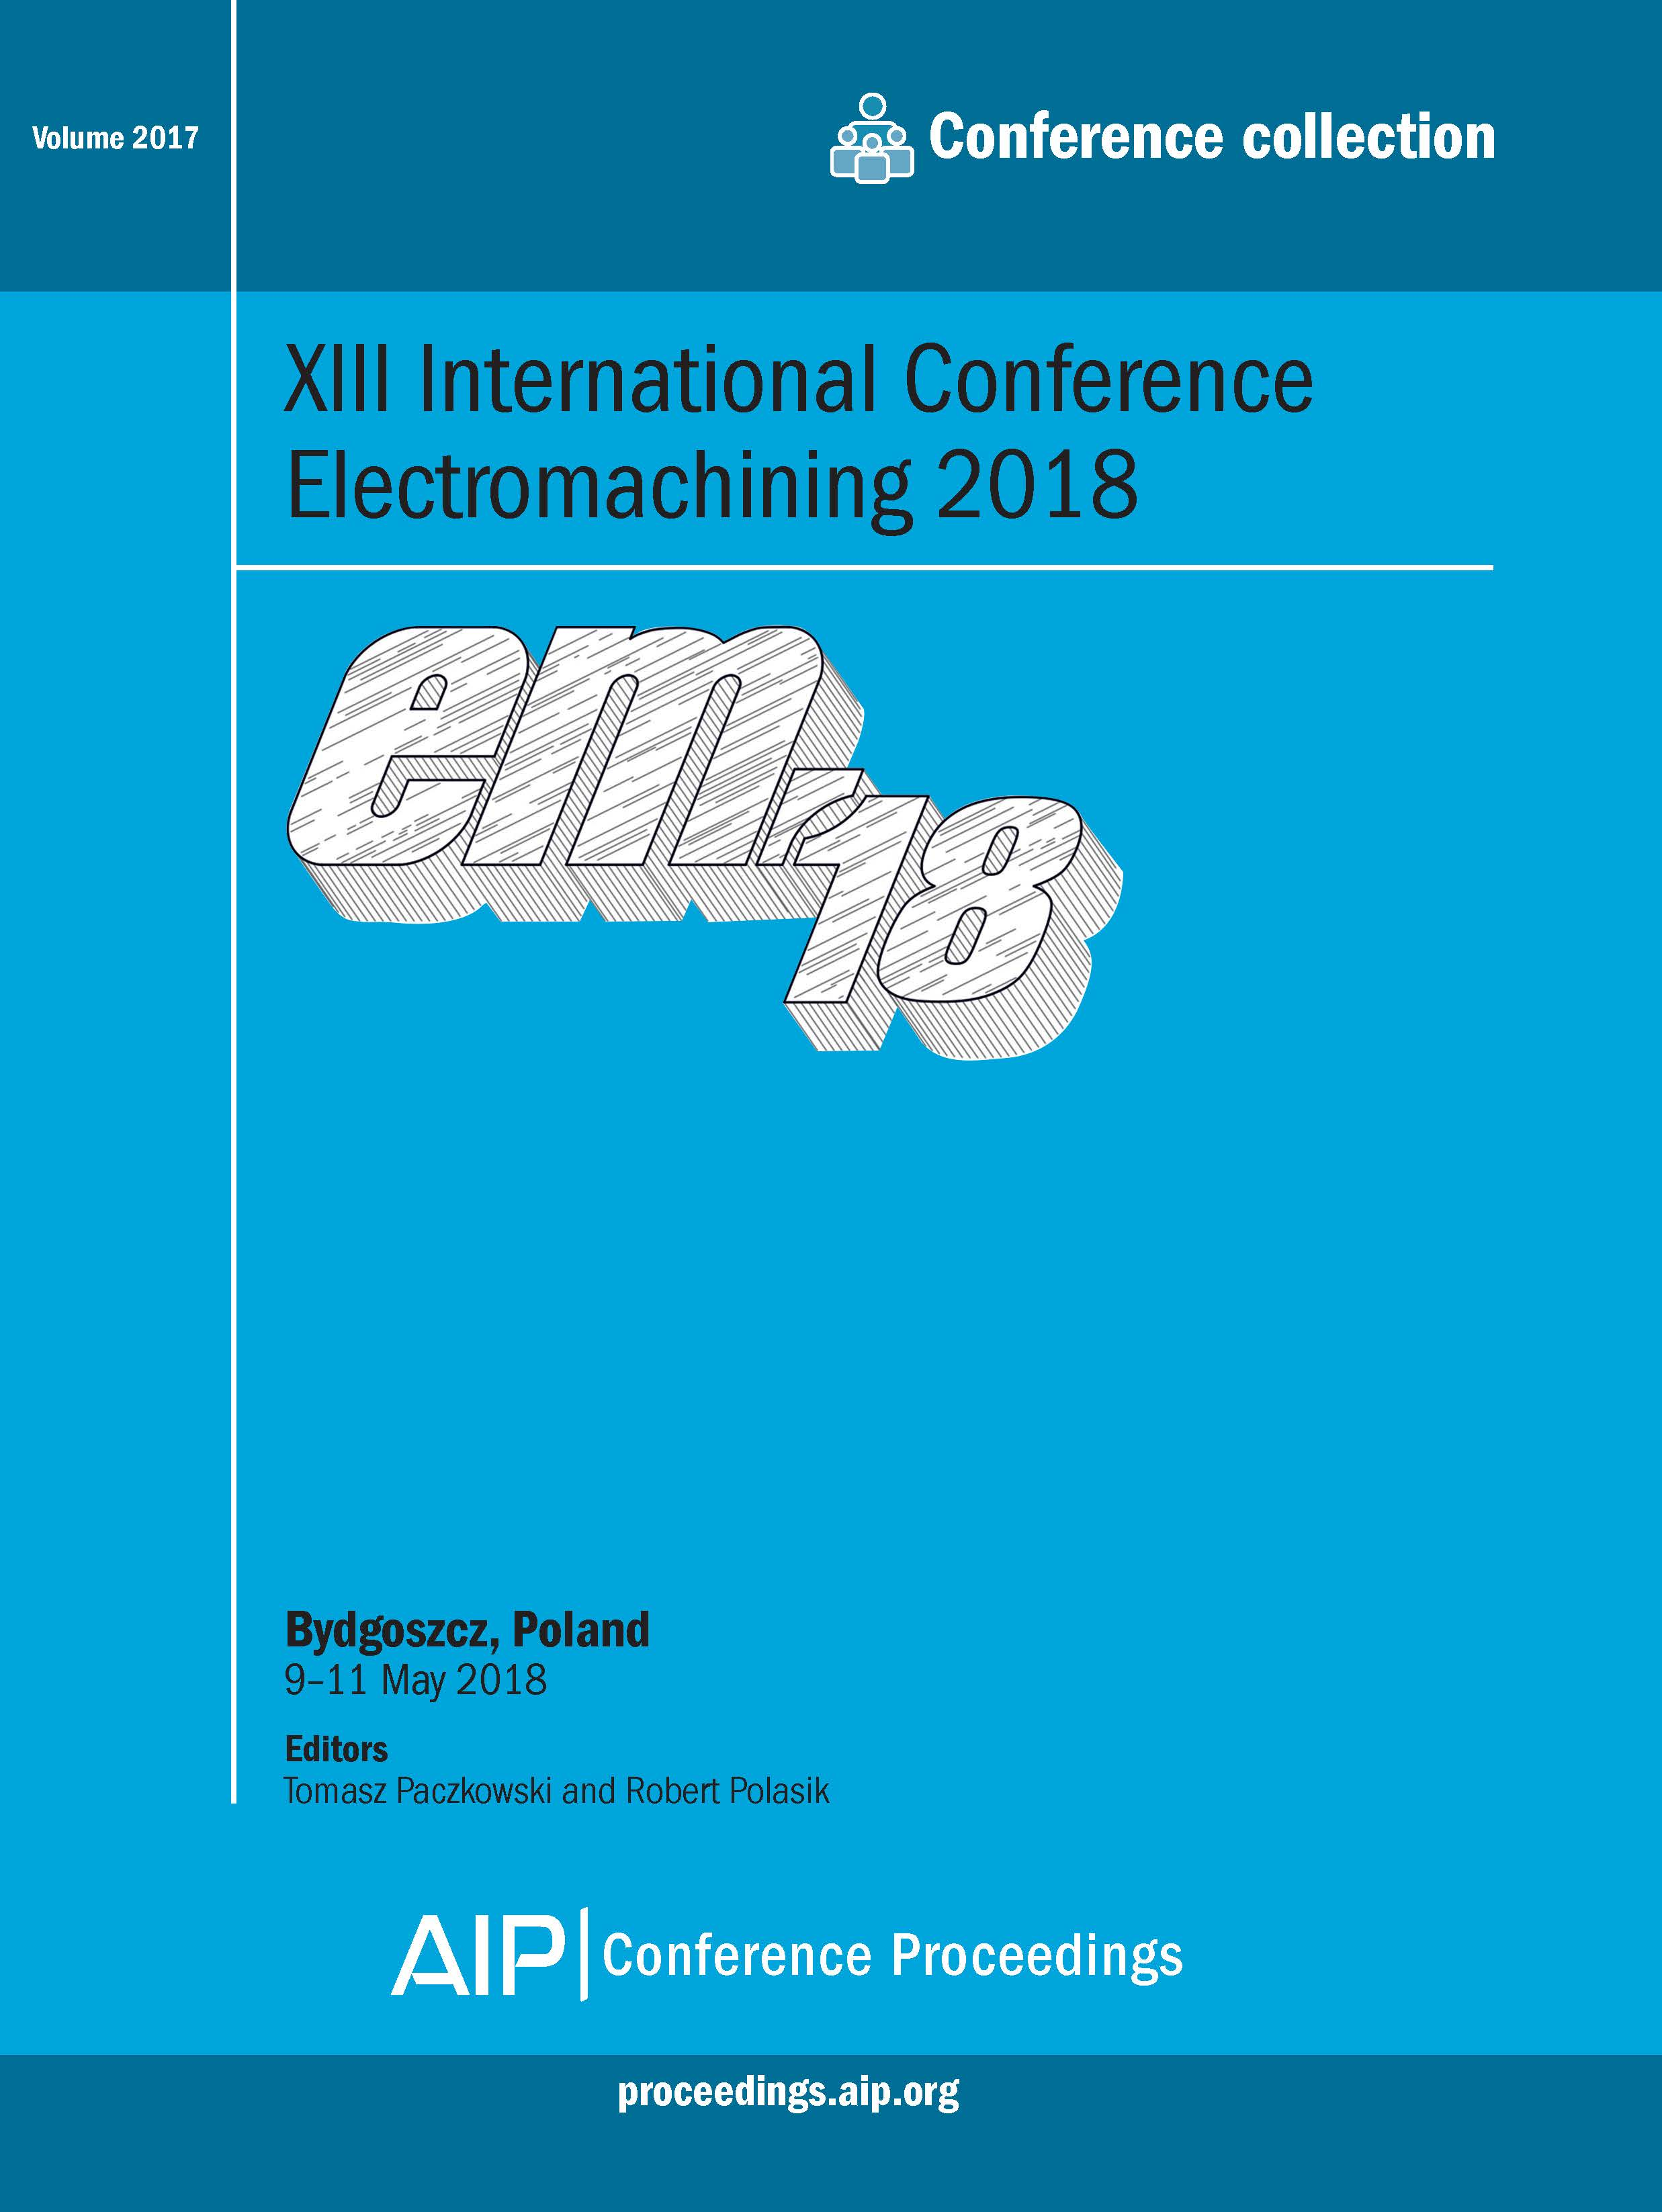 Volume 2017: XIII International Conference Electromachining 2018